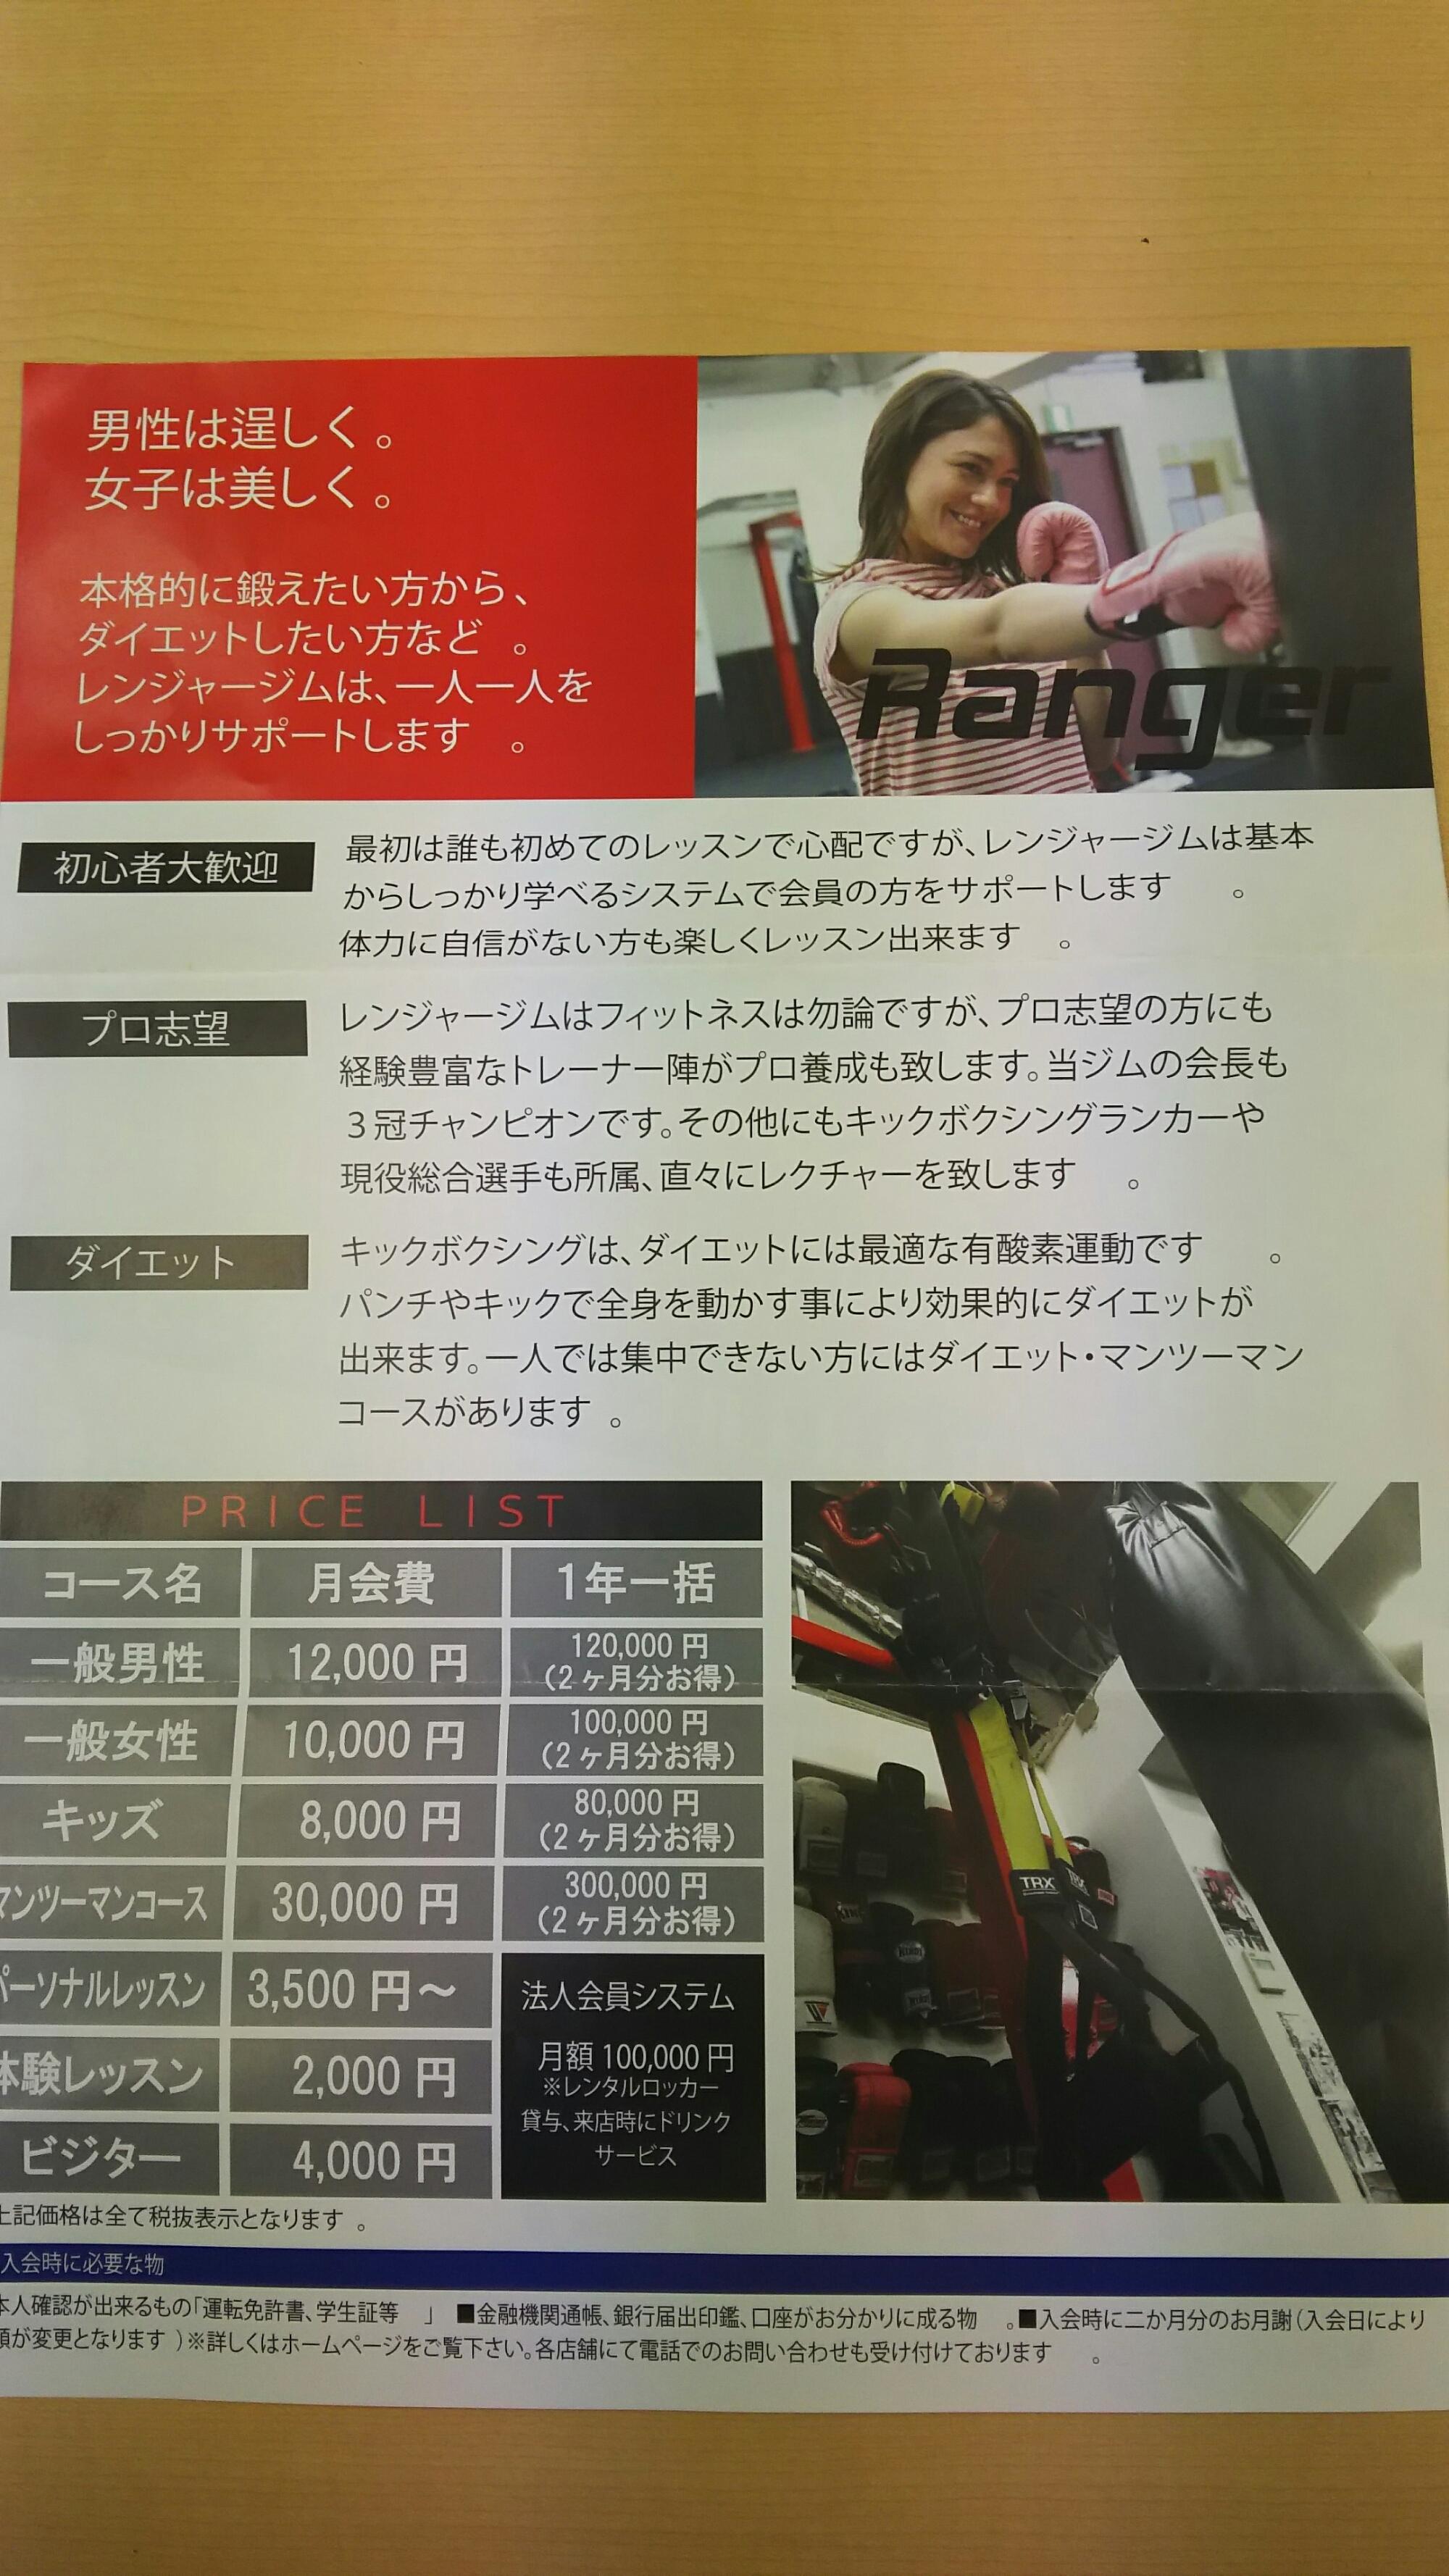 wpid wp 1461842454200 錦糸町からチャンピオン誕生?キックボクシングがジムOPEN!